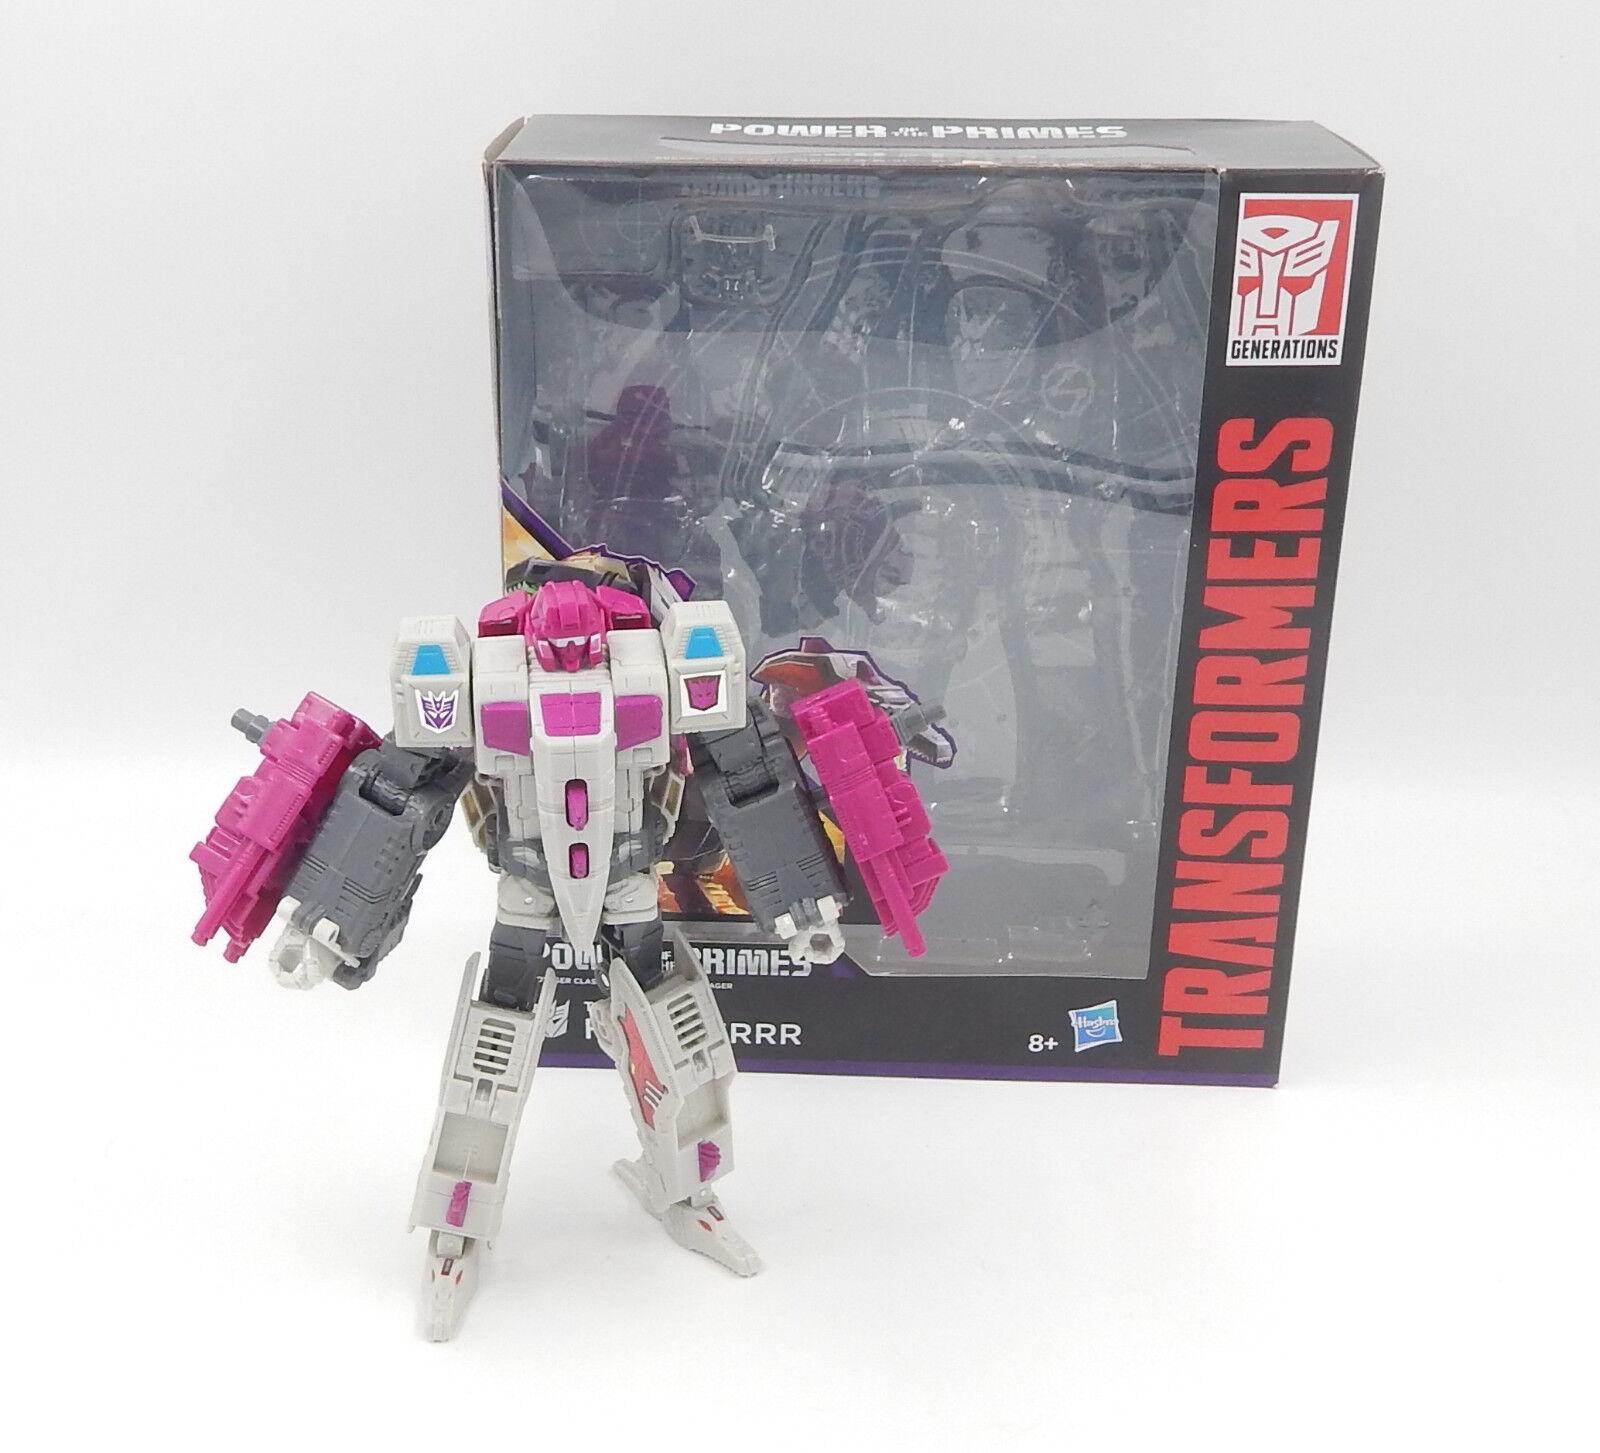 HASBRO TRANSFORMERS Power of the primes VOYAGER Terrorcon Hun-gurrr Action Personaggio